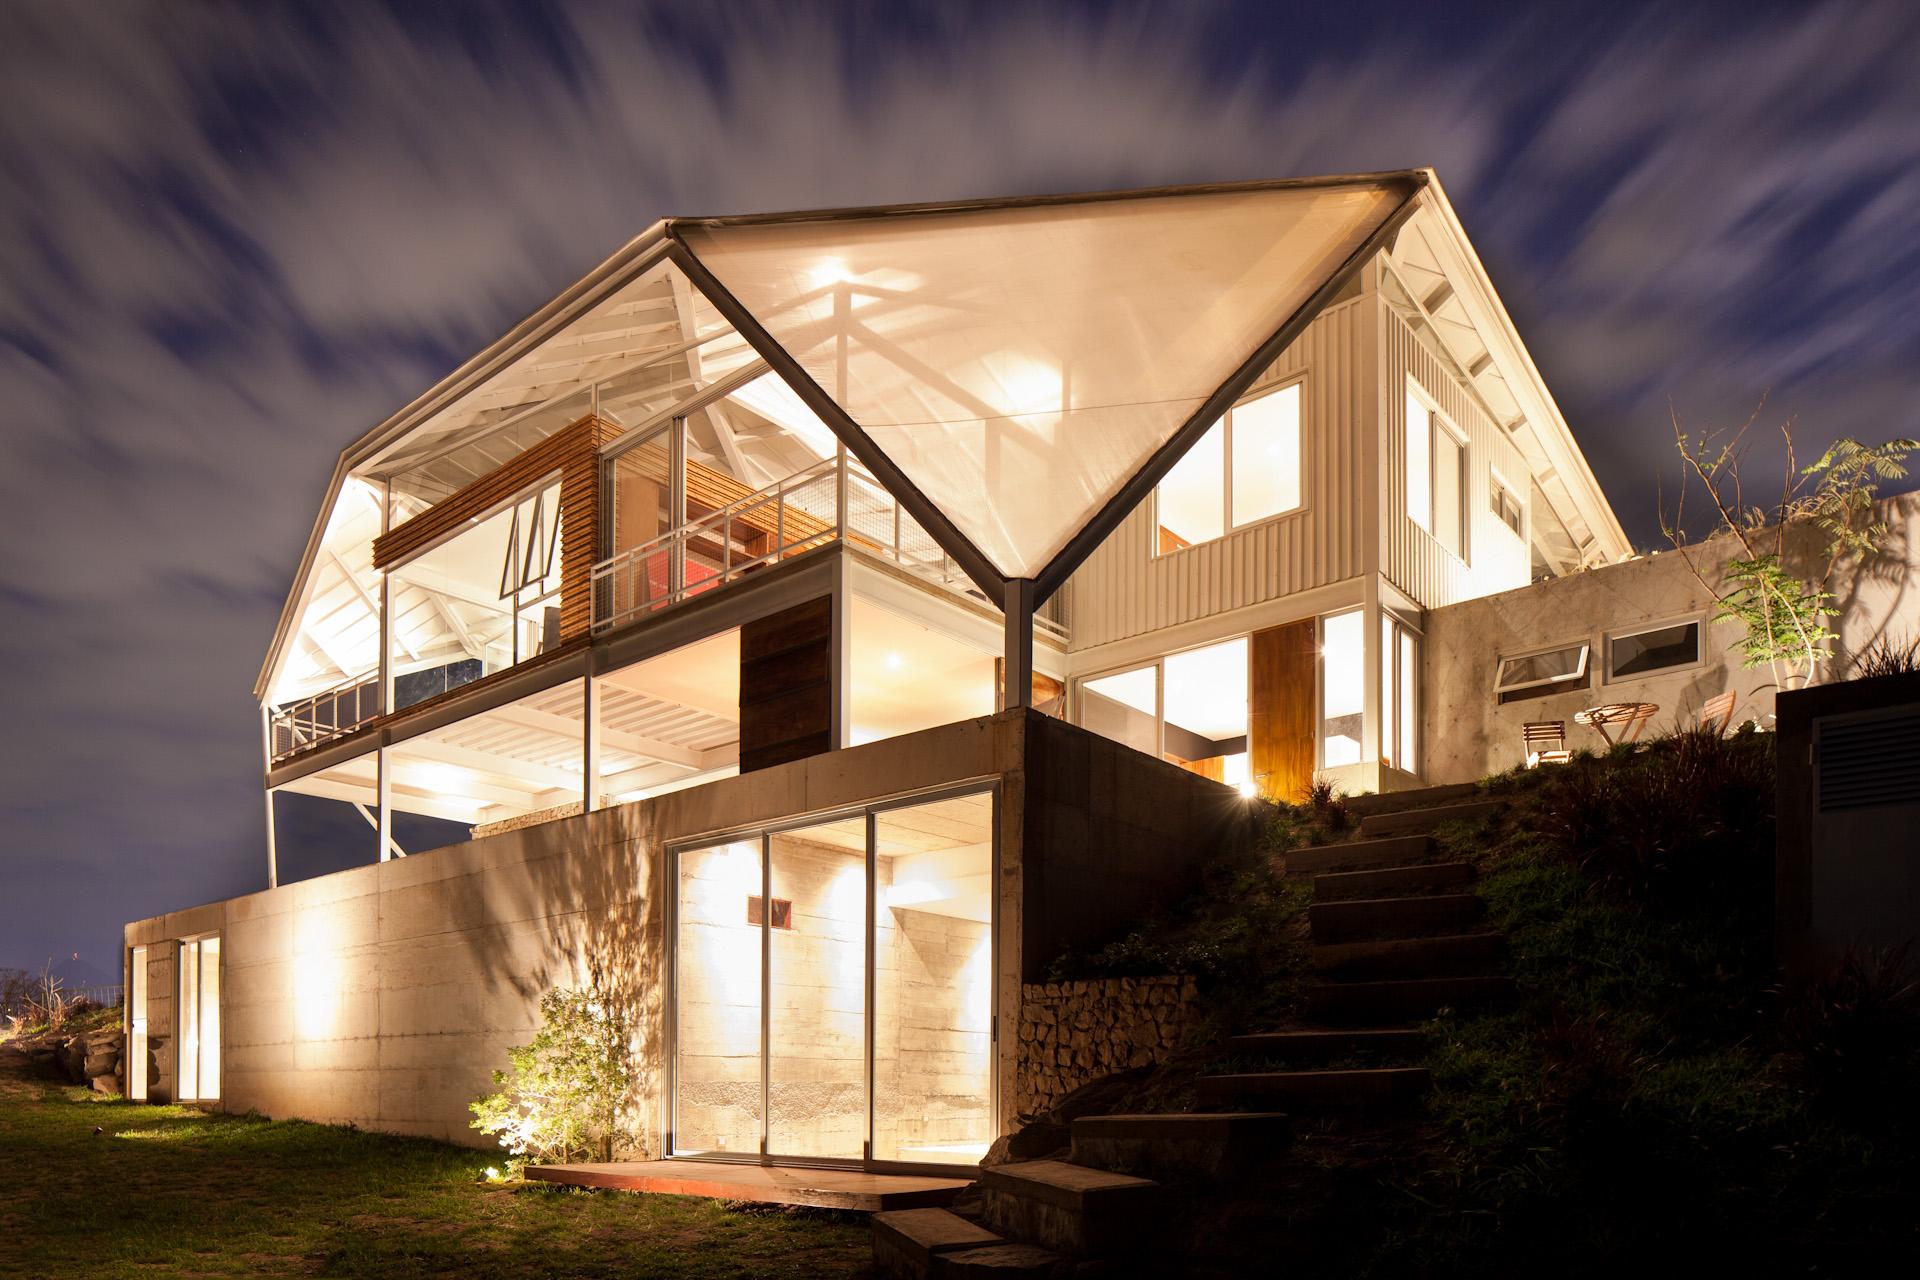 Architecture-Modern-La-Piscucha-El-Salvador-Dwell-Night-16.JPG